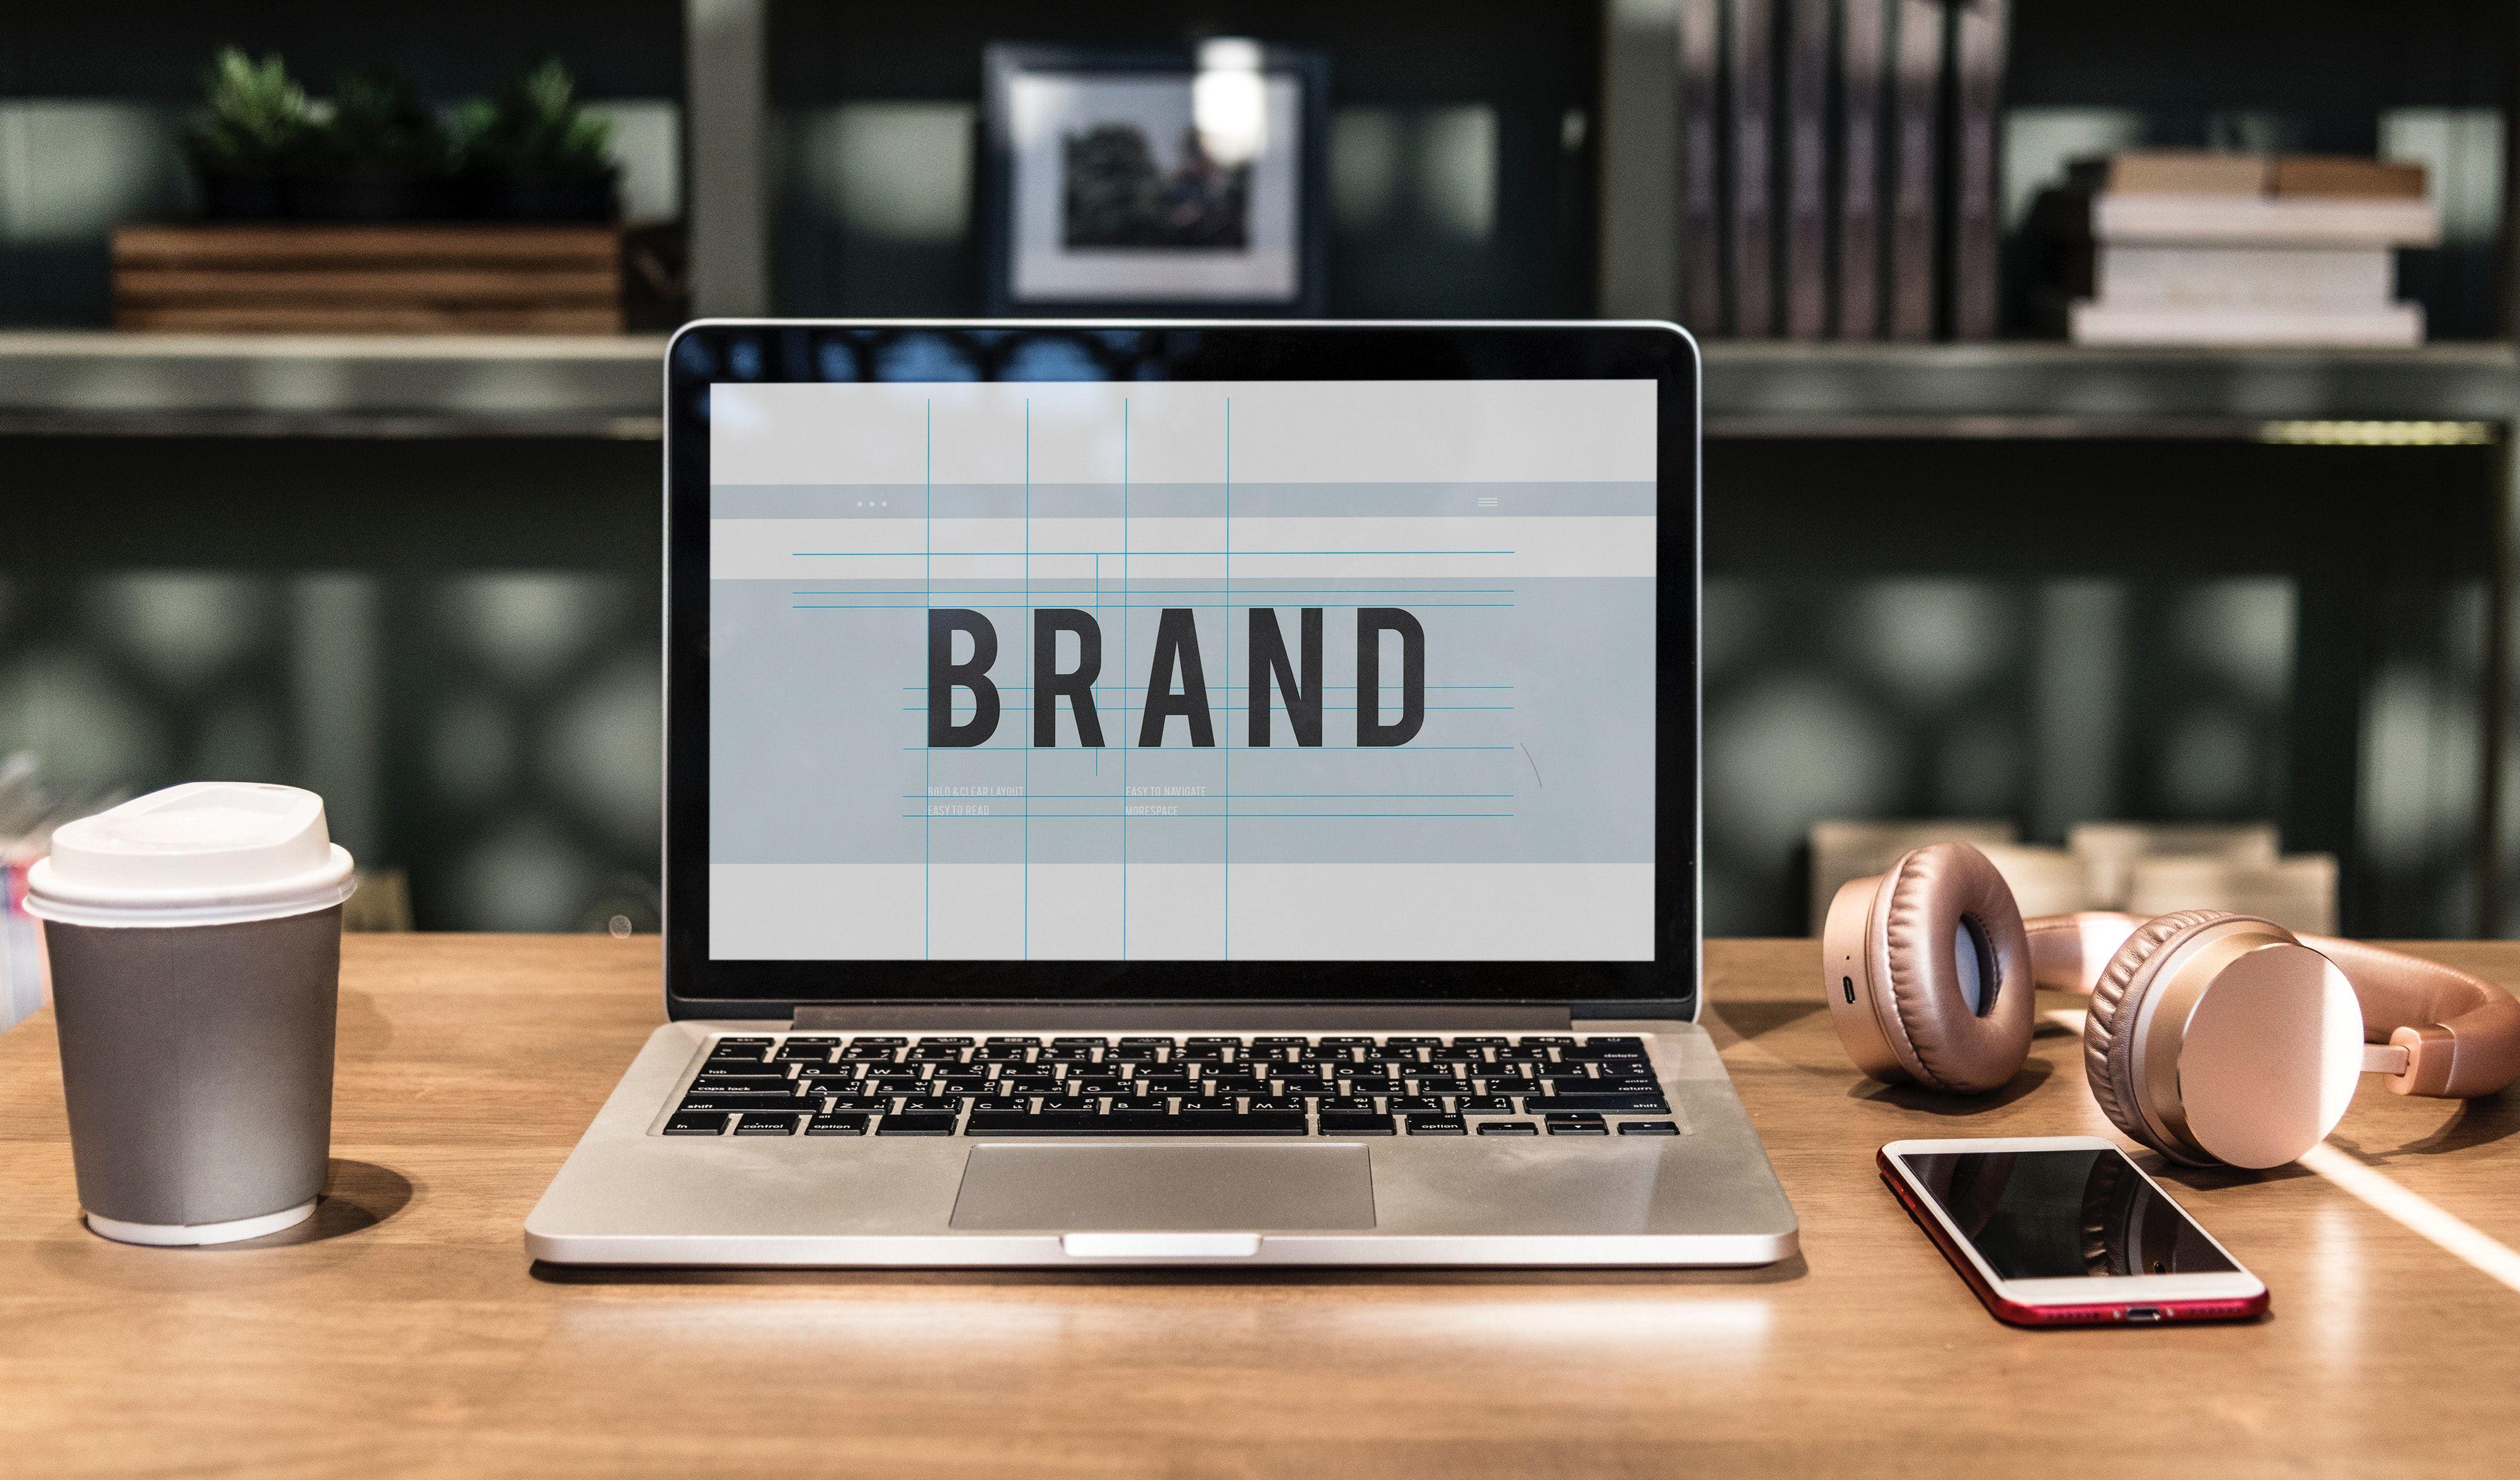 Advertising Branding